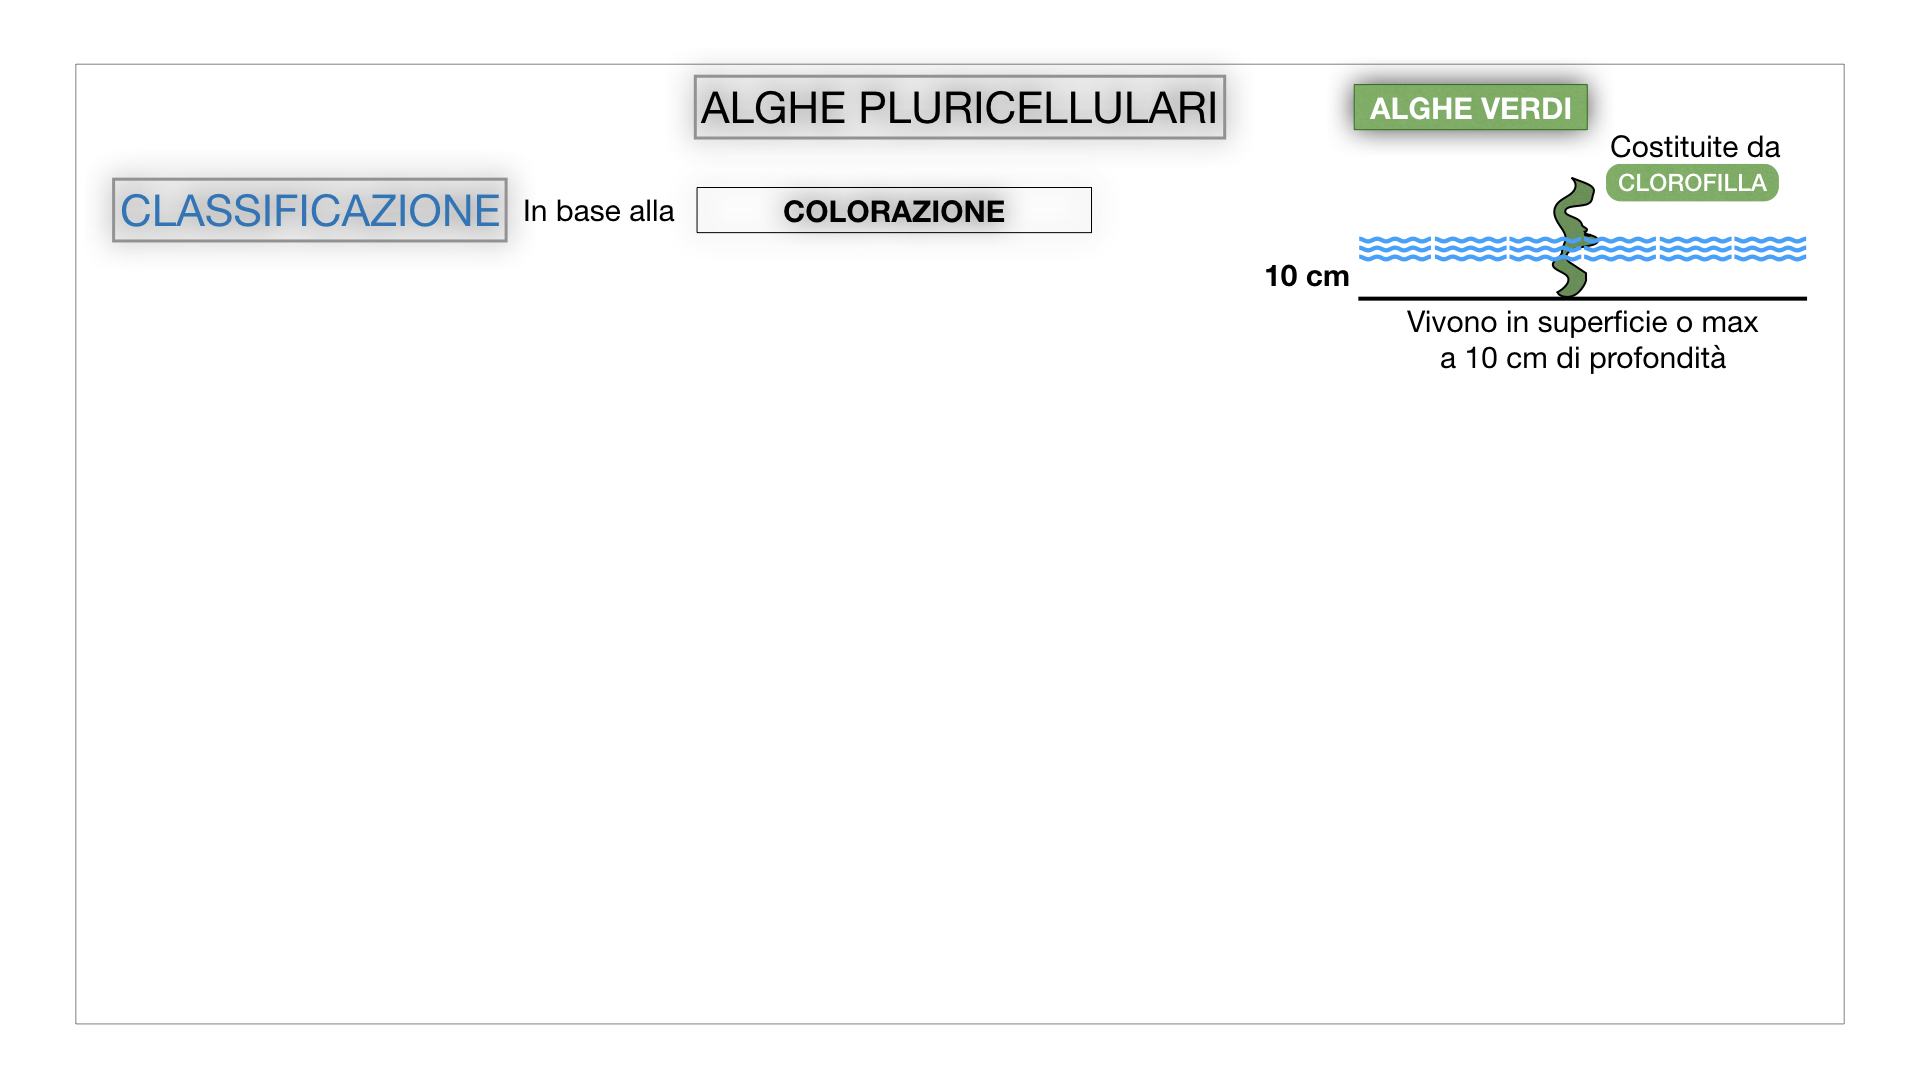 8. alghe uni_pluri_cellulari_SIMULAZIONE.046